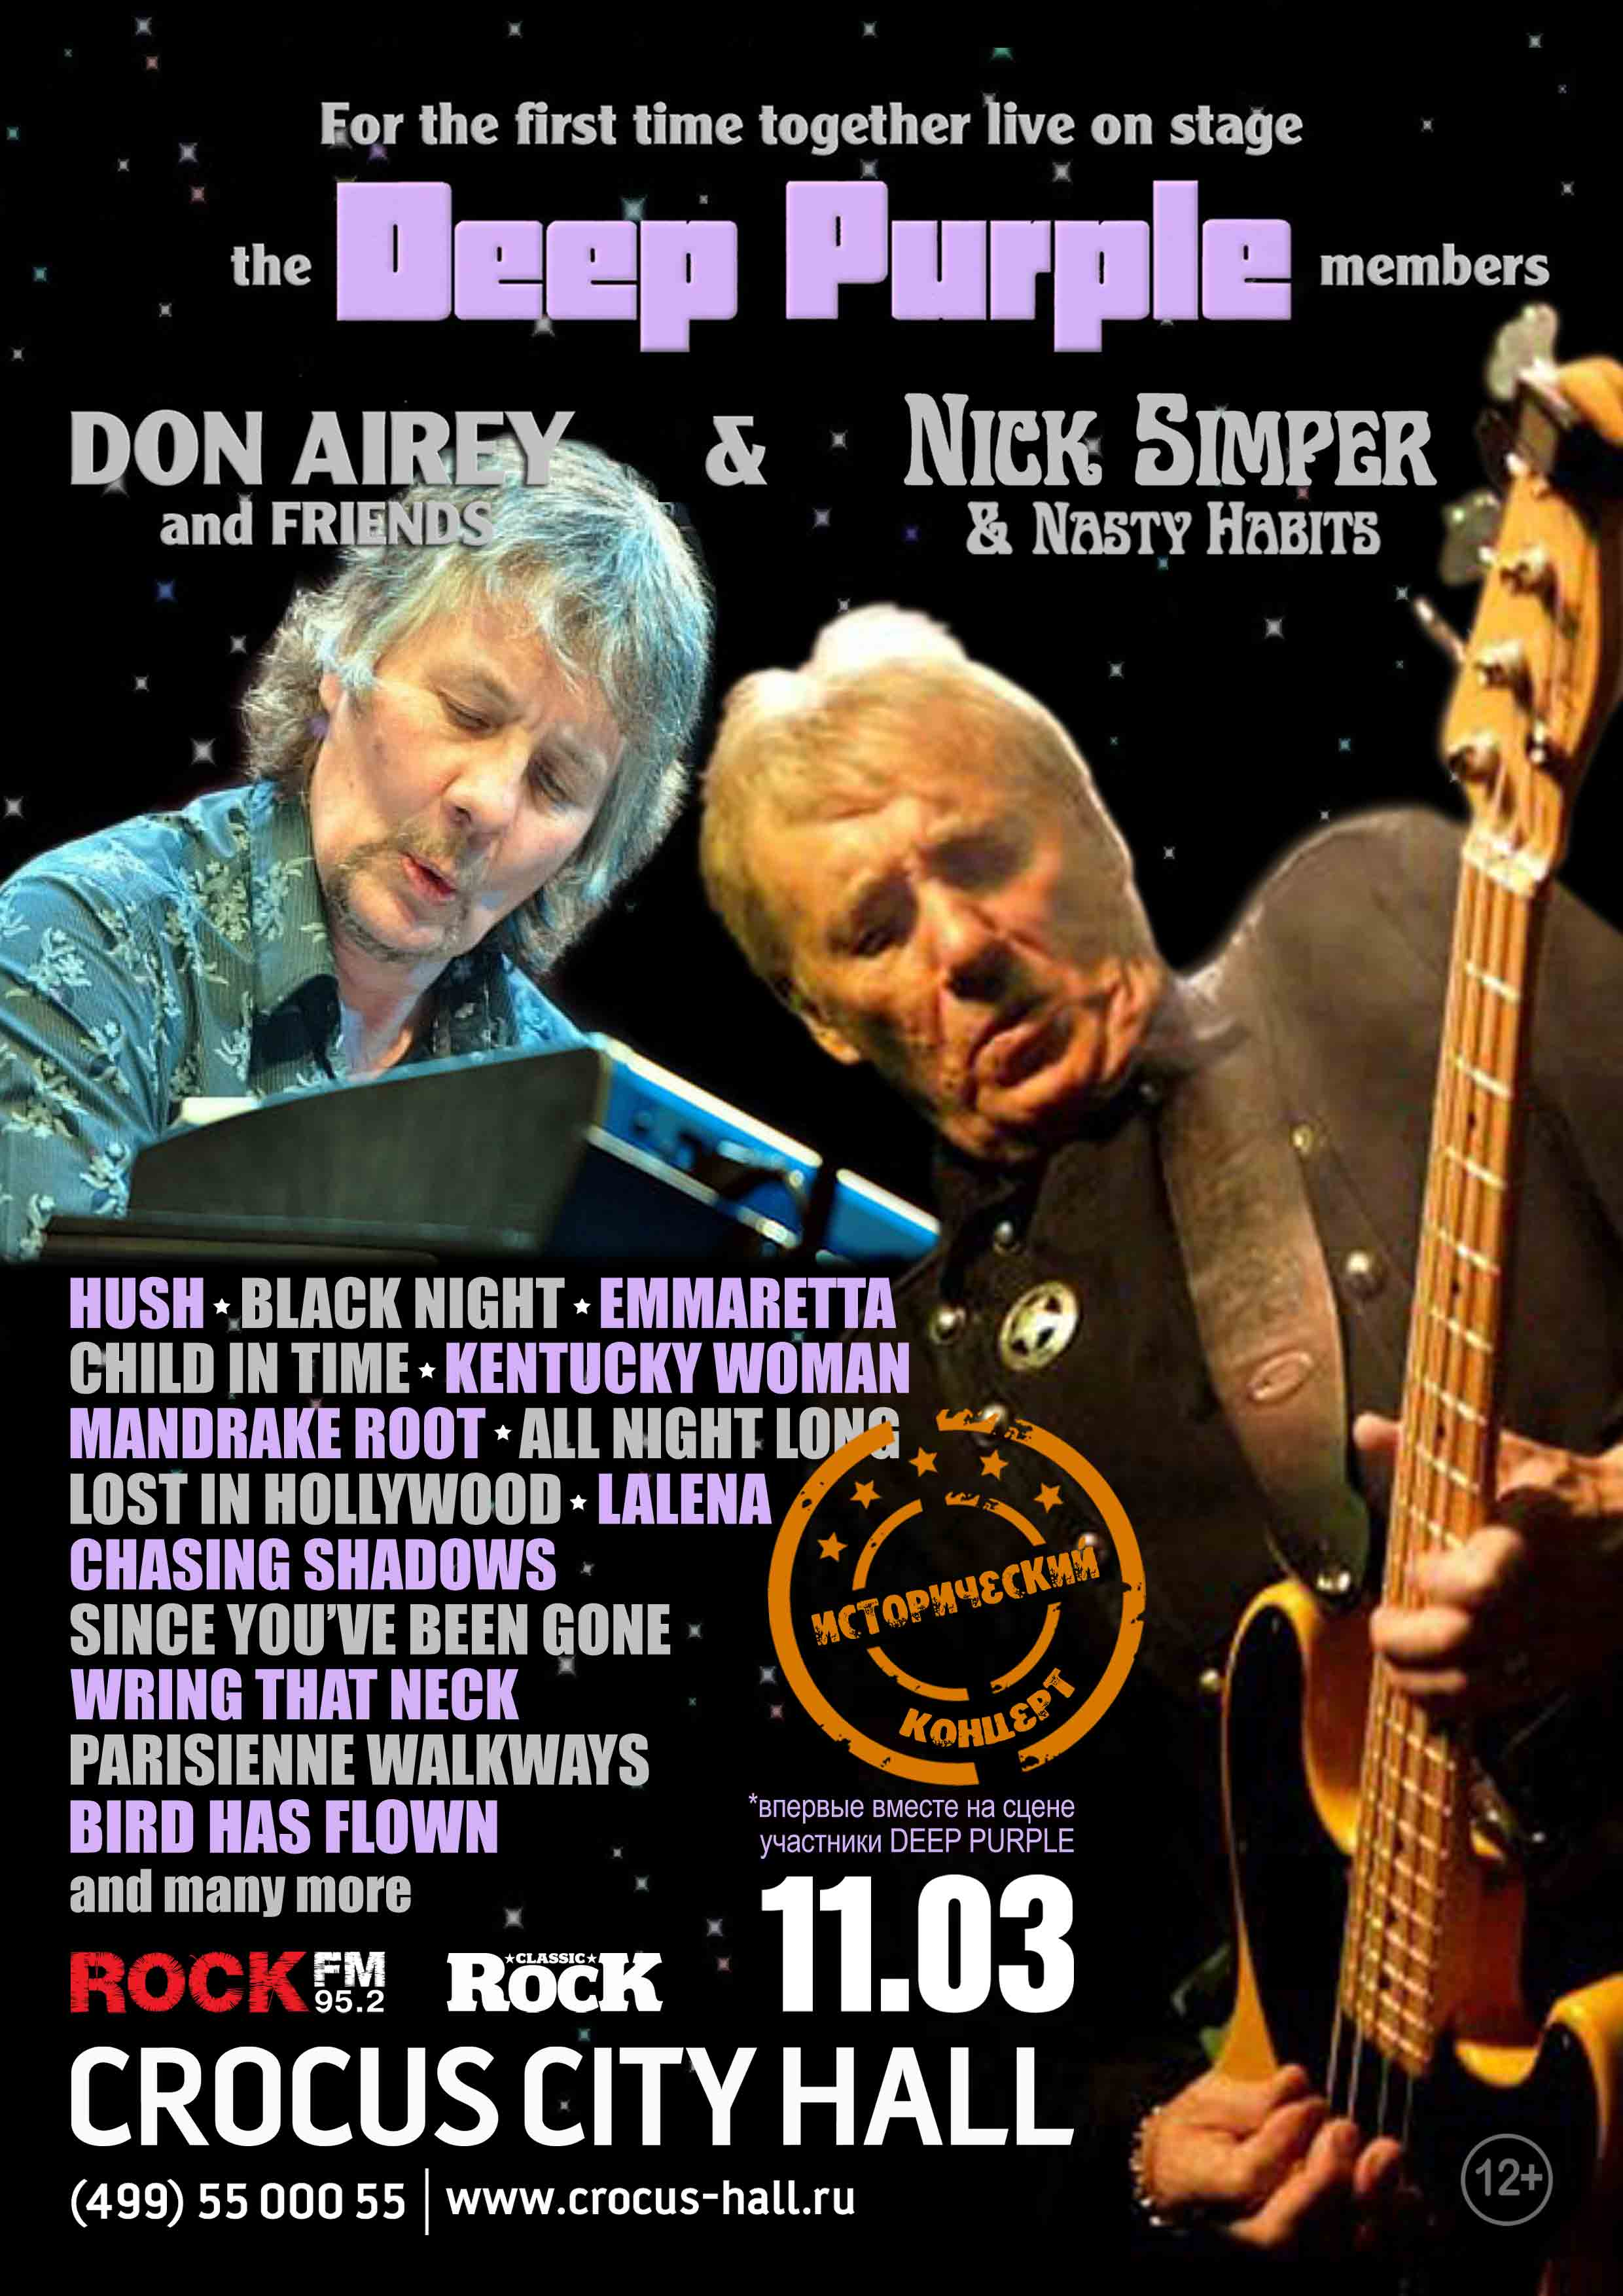 Don Airey Nick Simper site Crocus - The DEEP PURPLE stars - DON AIREY & NICK SIMPER